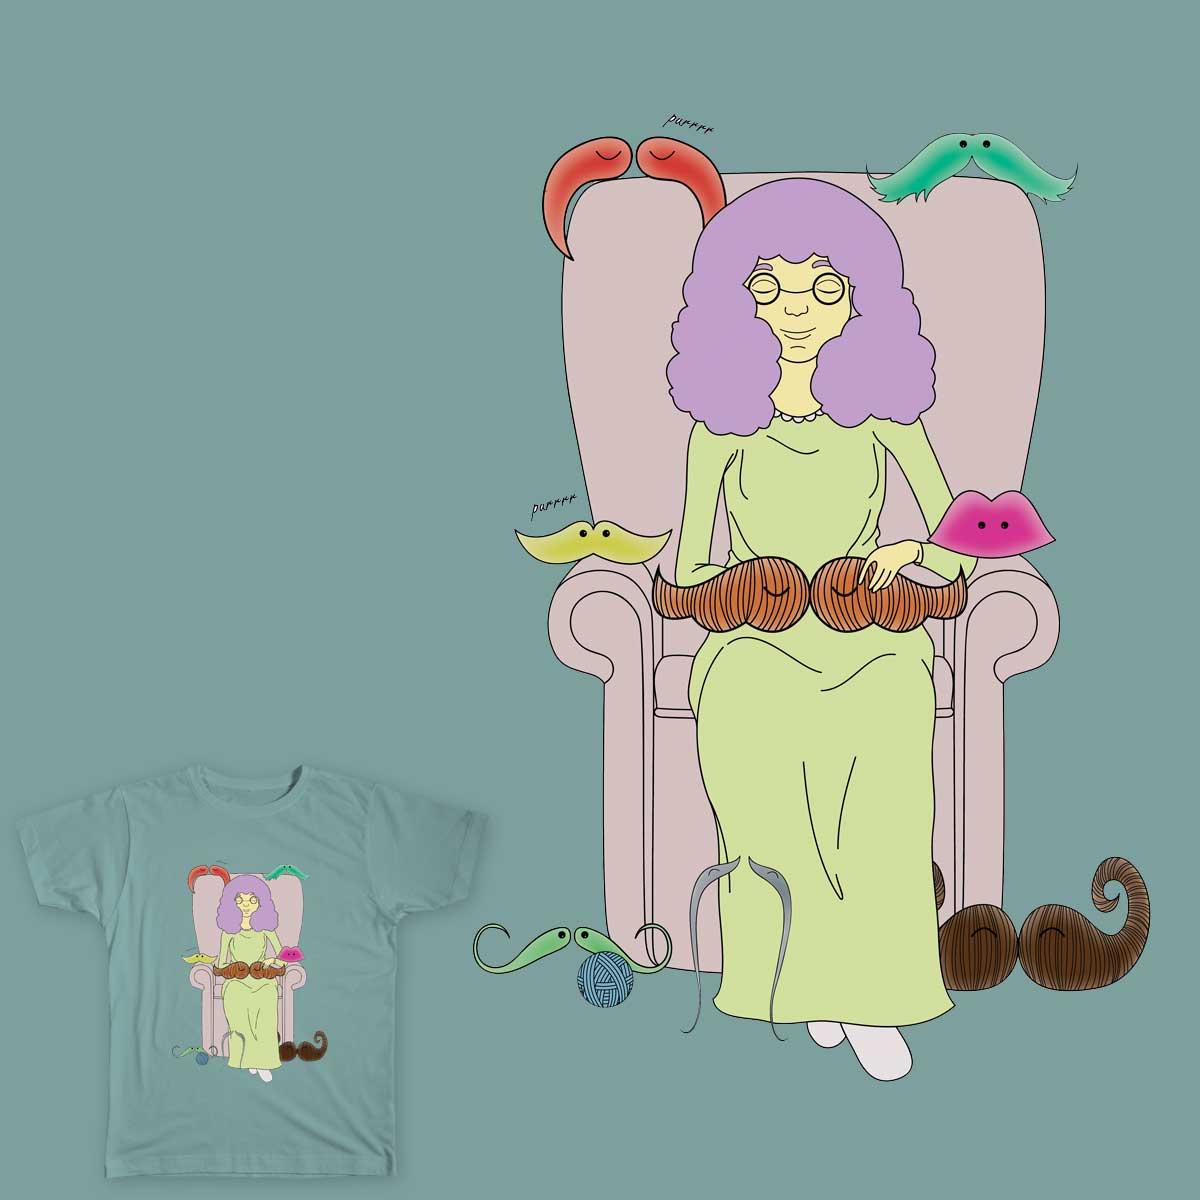 Crazy 'Stache Lady by kalmansor on Threadless